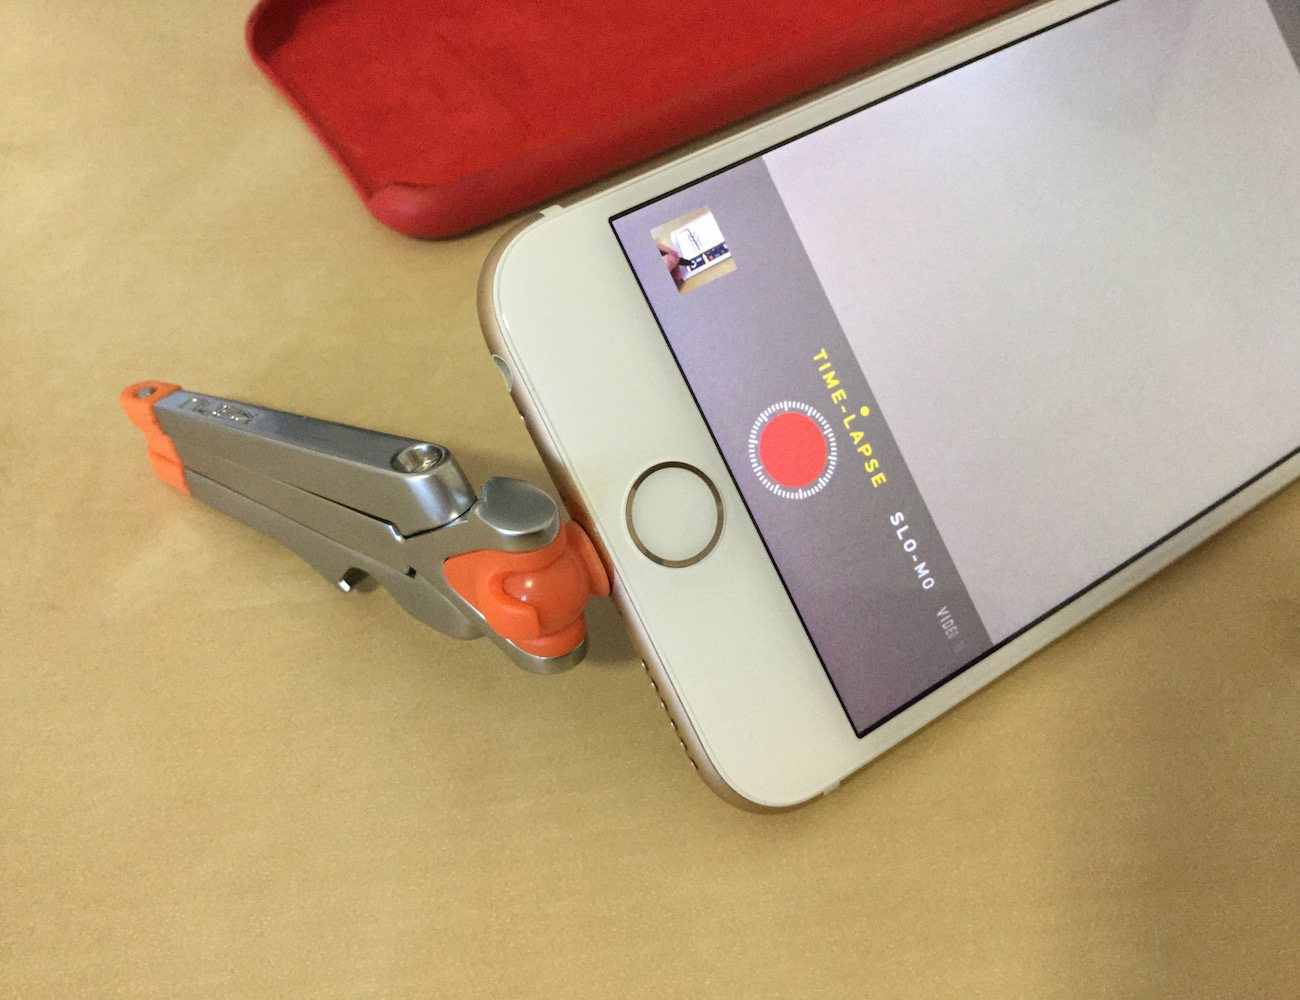 kenu-stance-compact-iphone-tripod-02